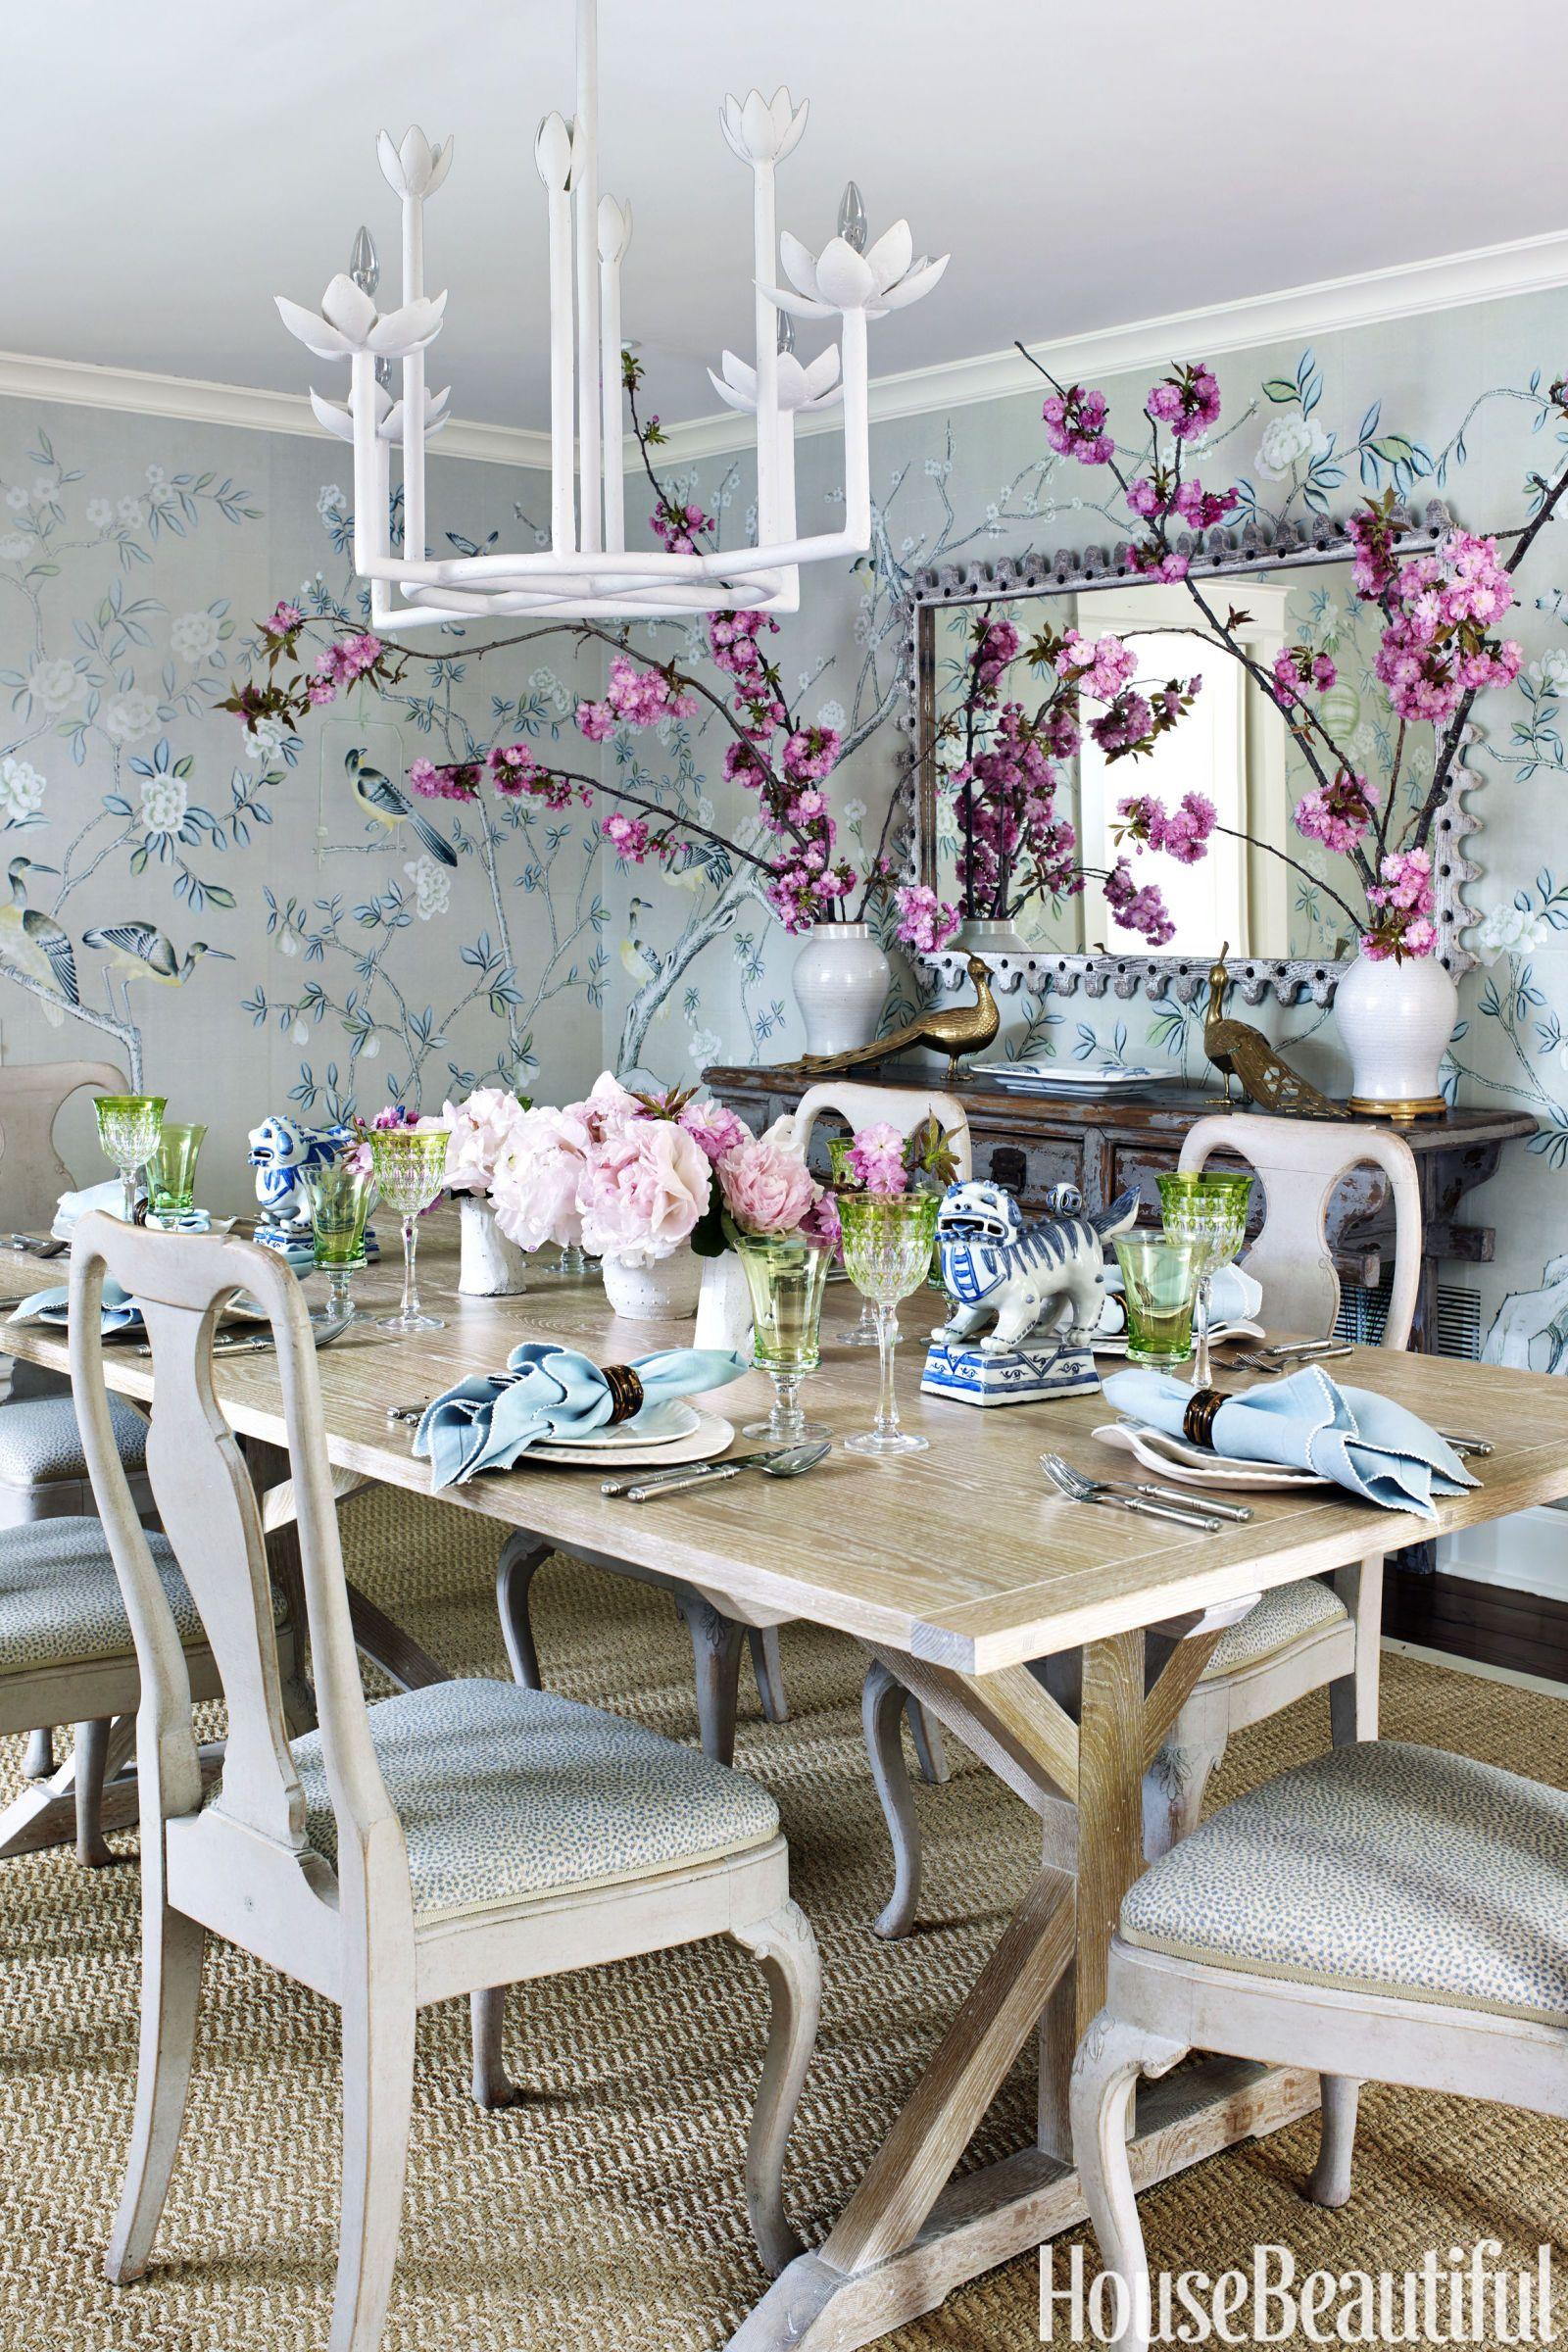 Rajini farmhouse decor